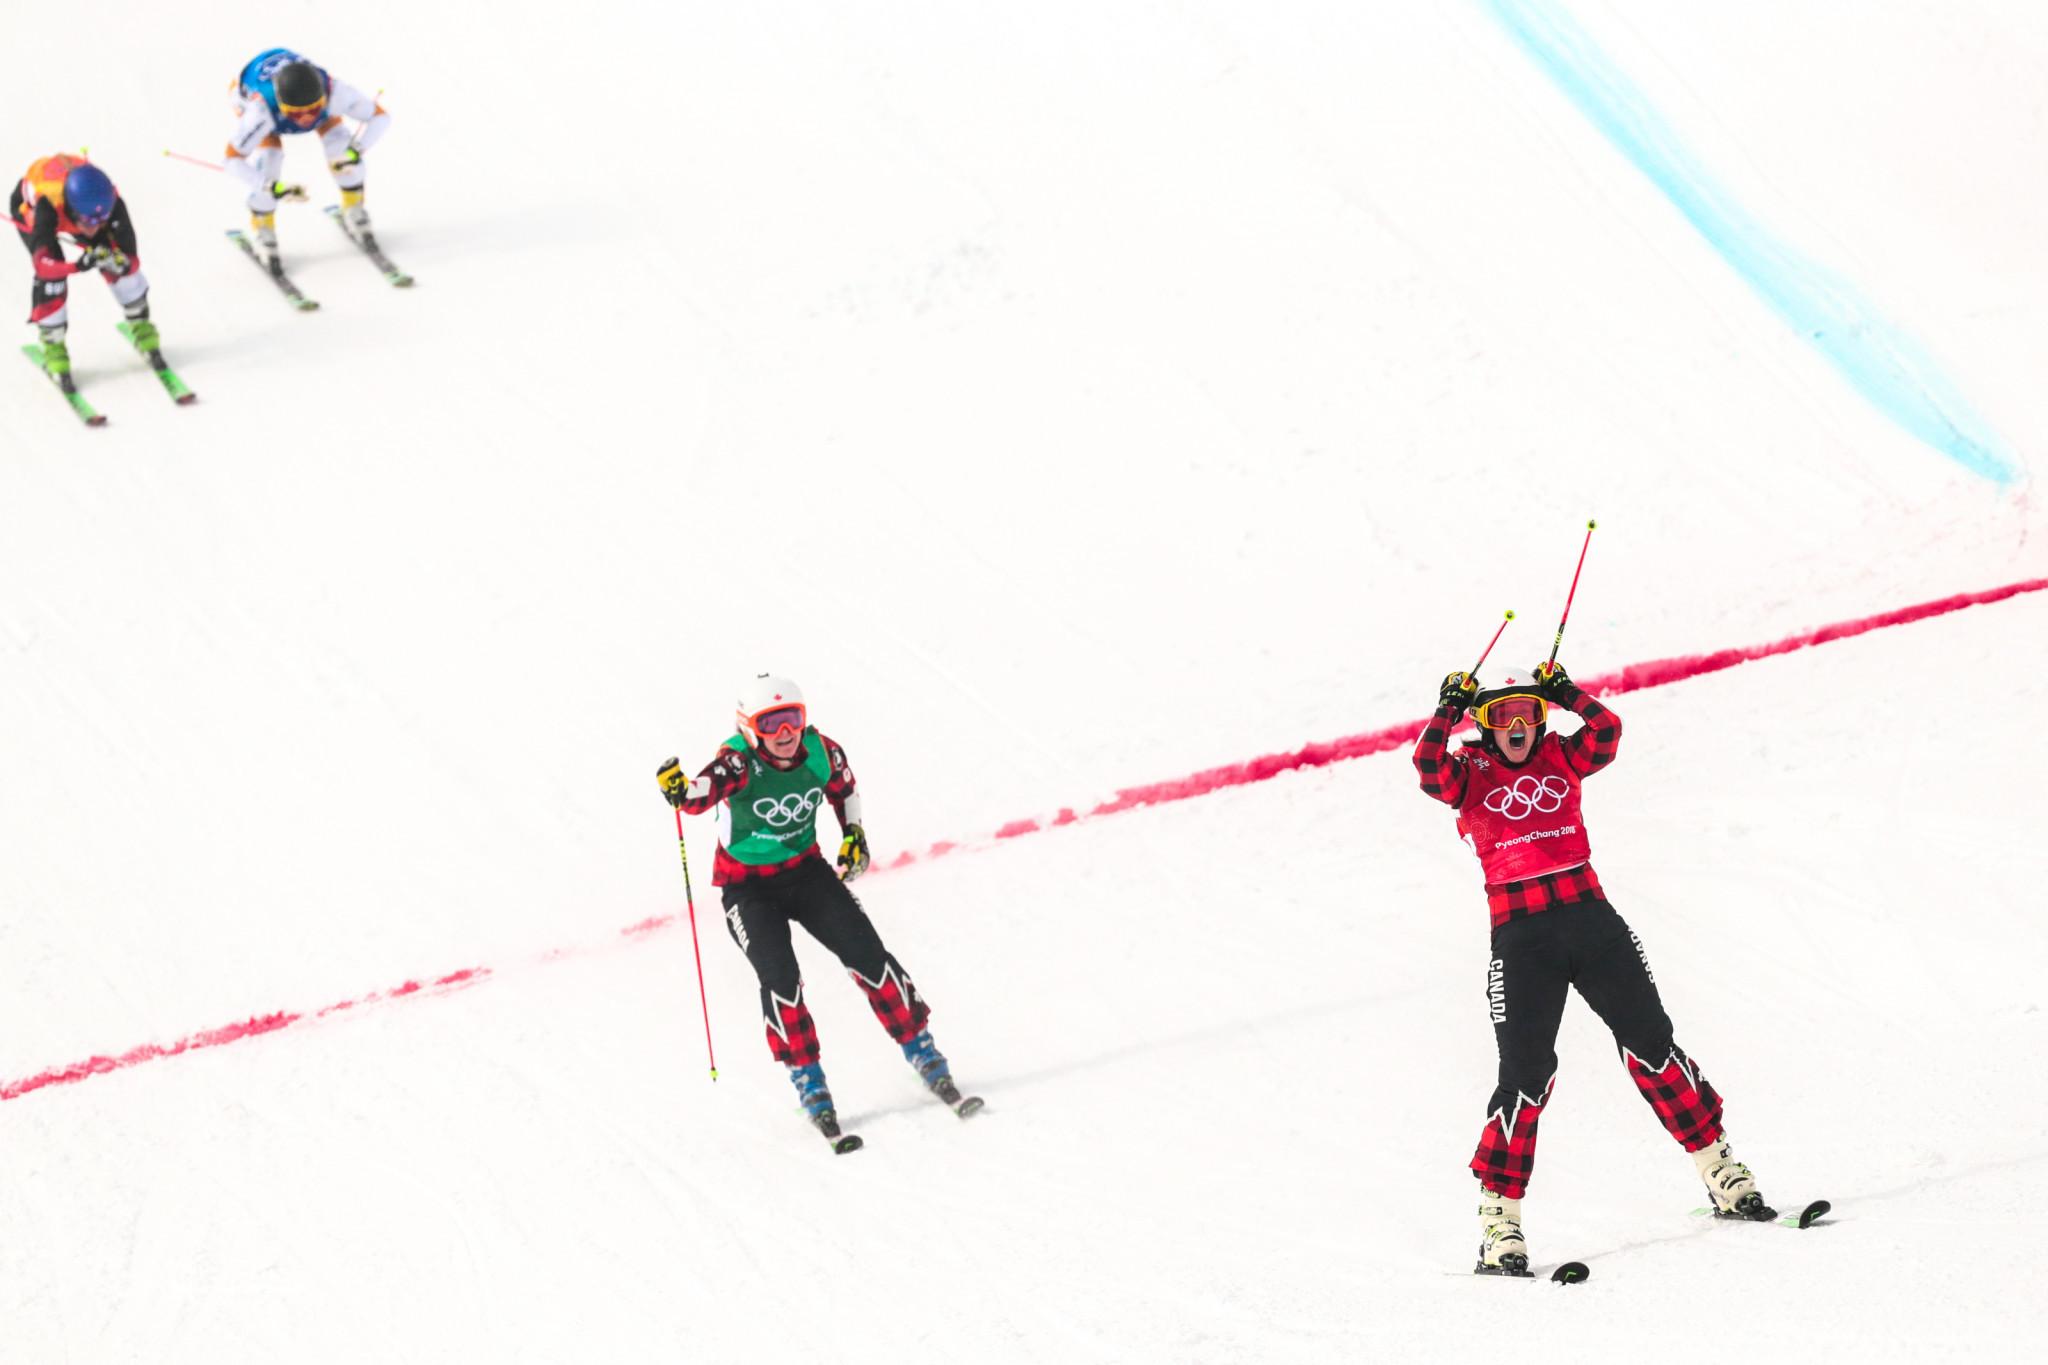 Canada's Kelsey Serwa celebrates winning  Olympic gold in ski cross at Pyengchang 2018 ©Getty Images